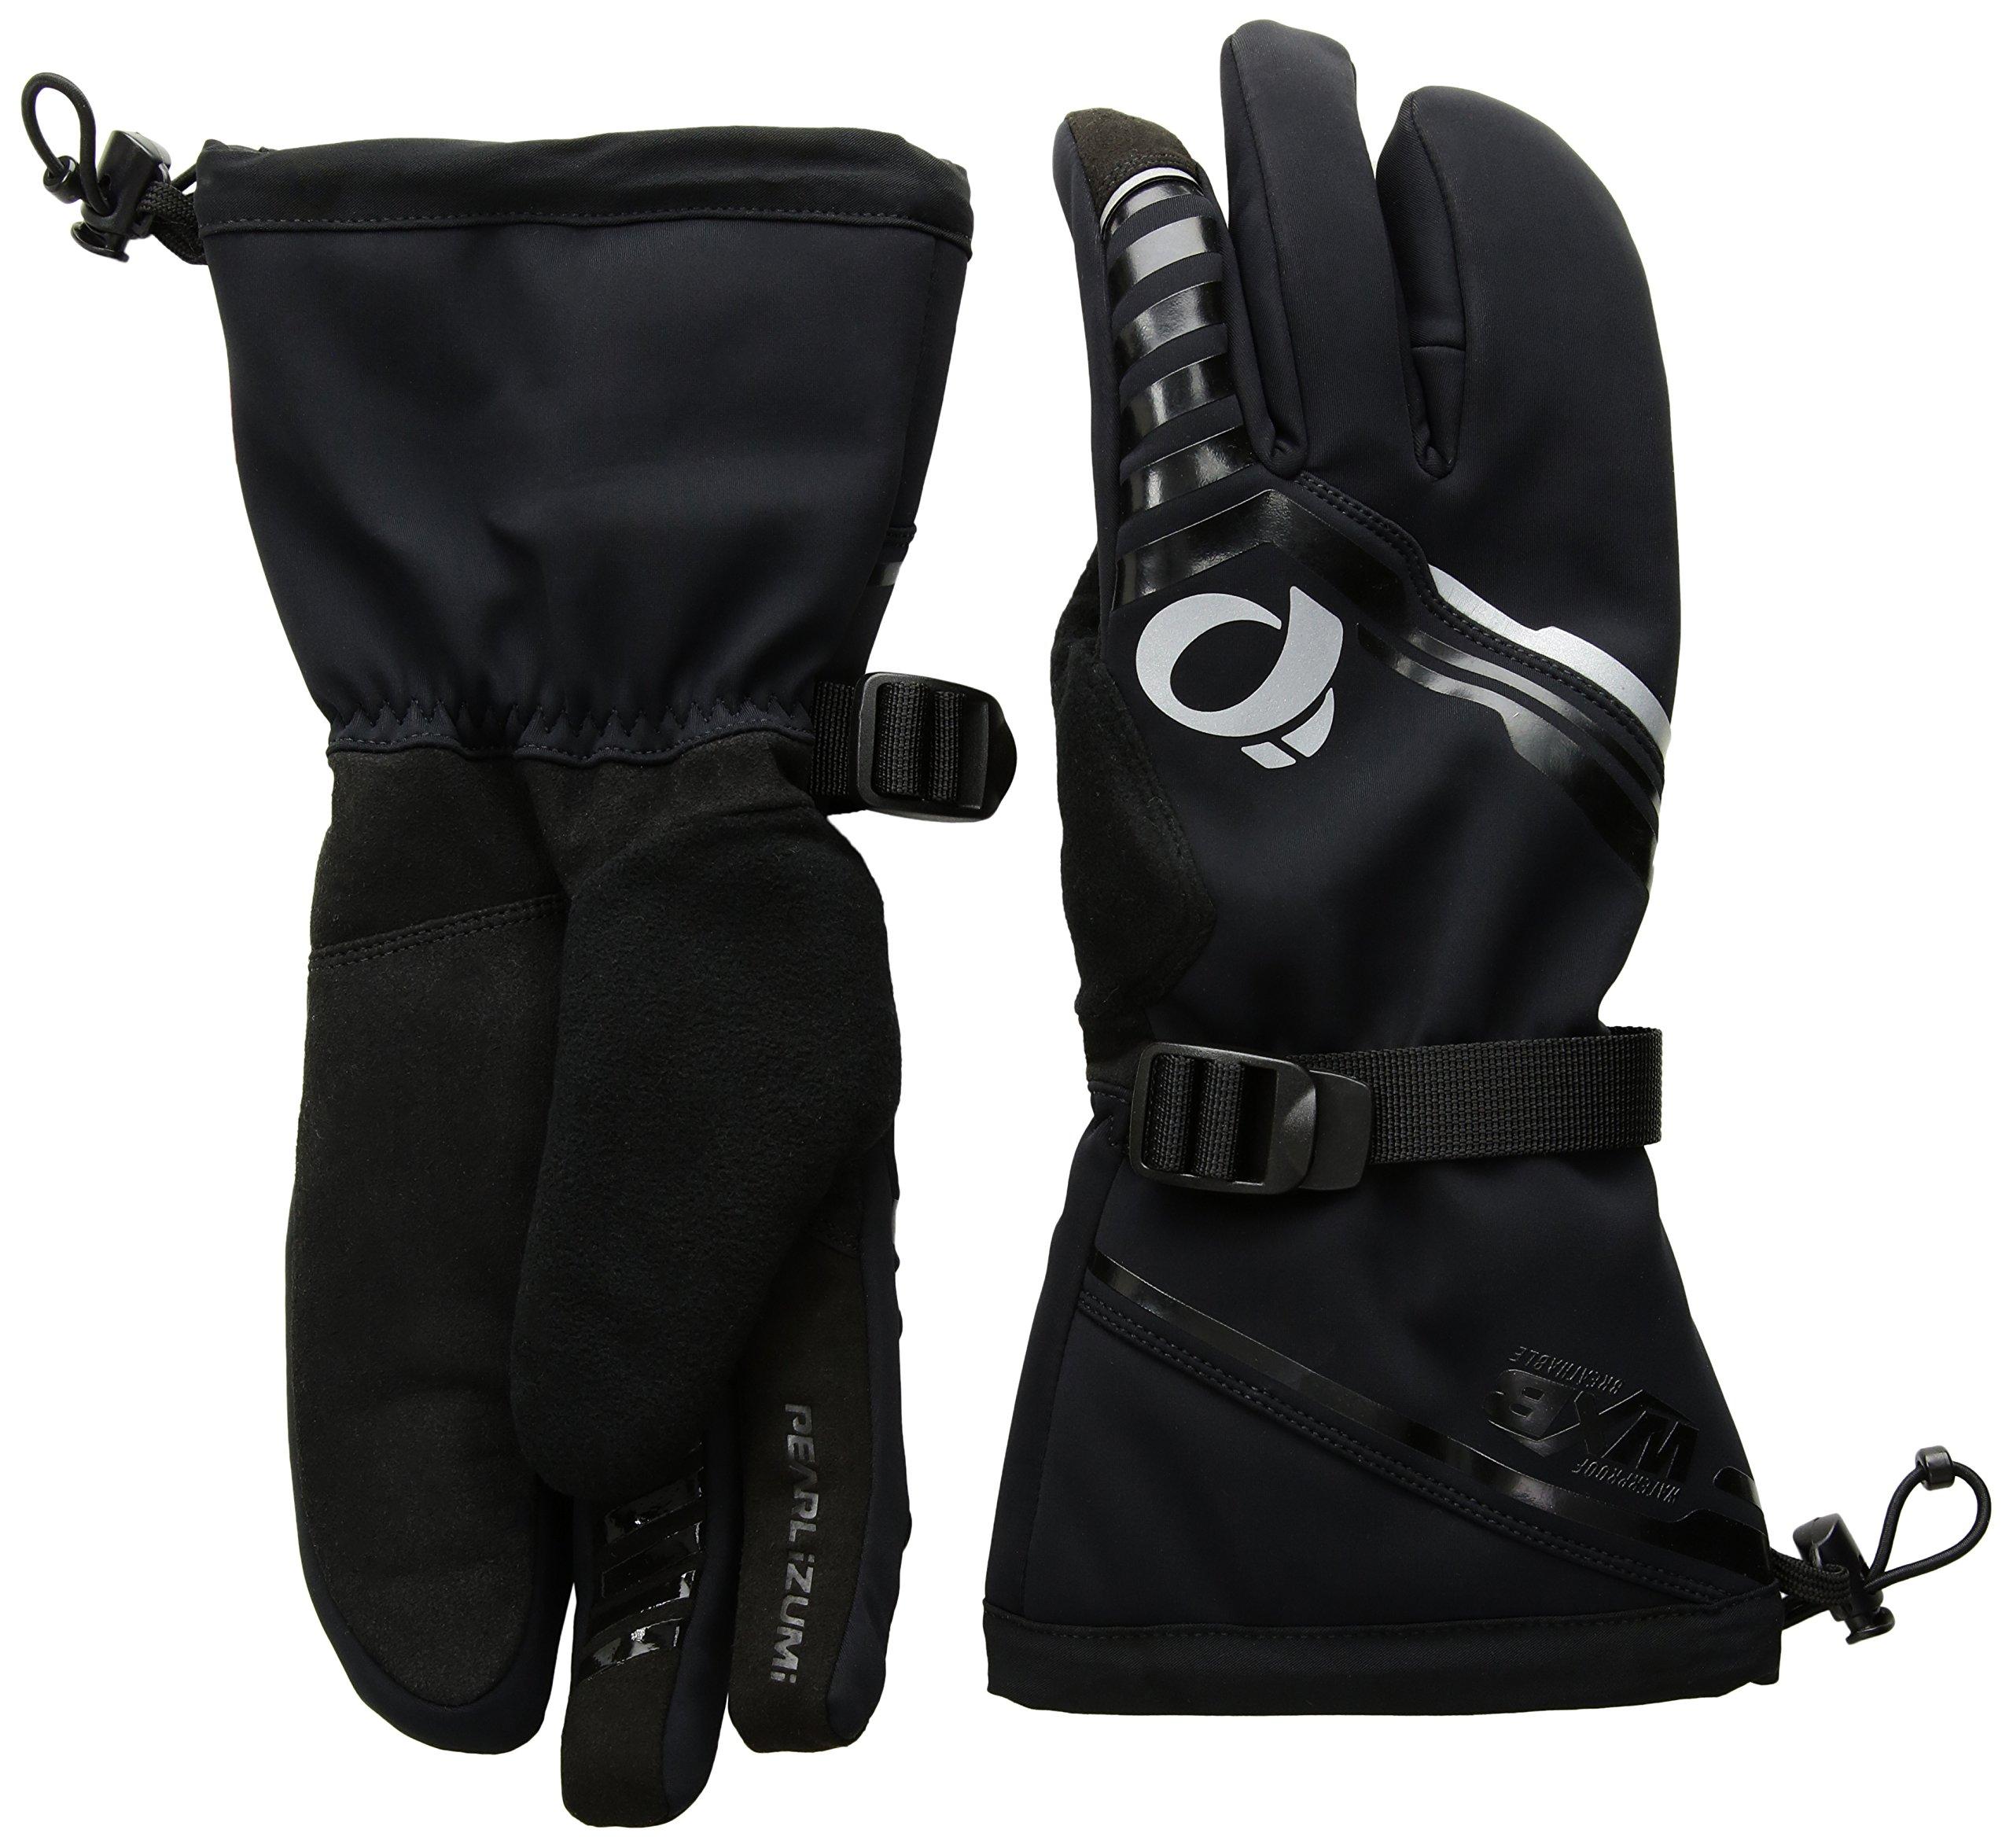 Pearl iZUMi Pro Amfib Super Gloves, Black/Black, Large